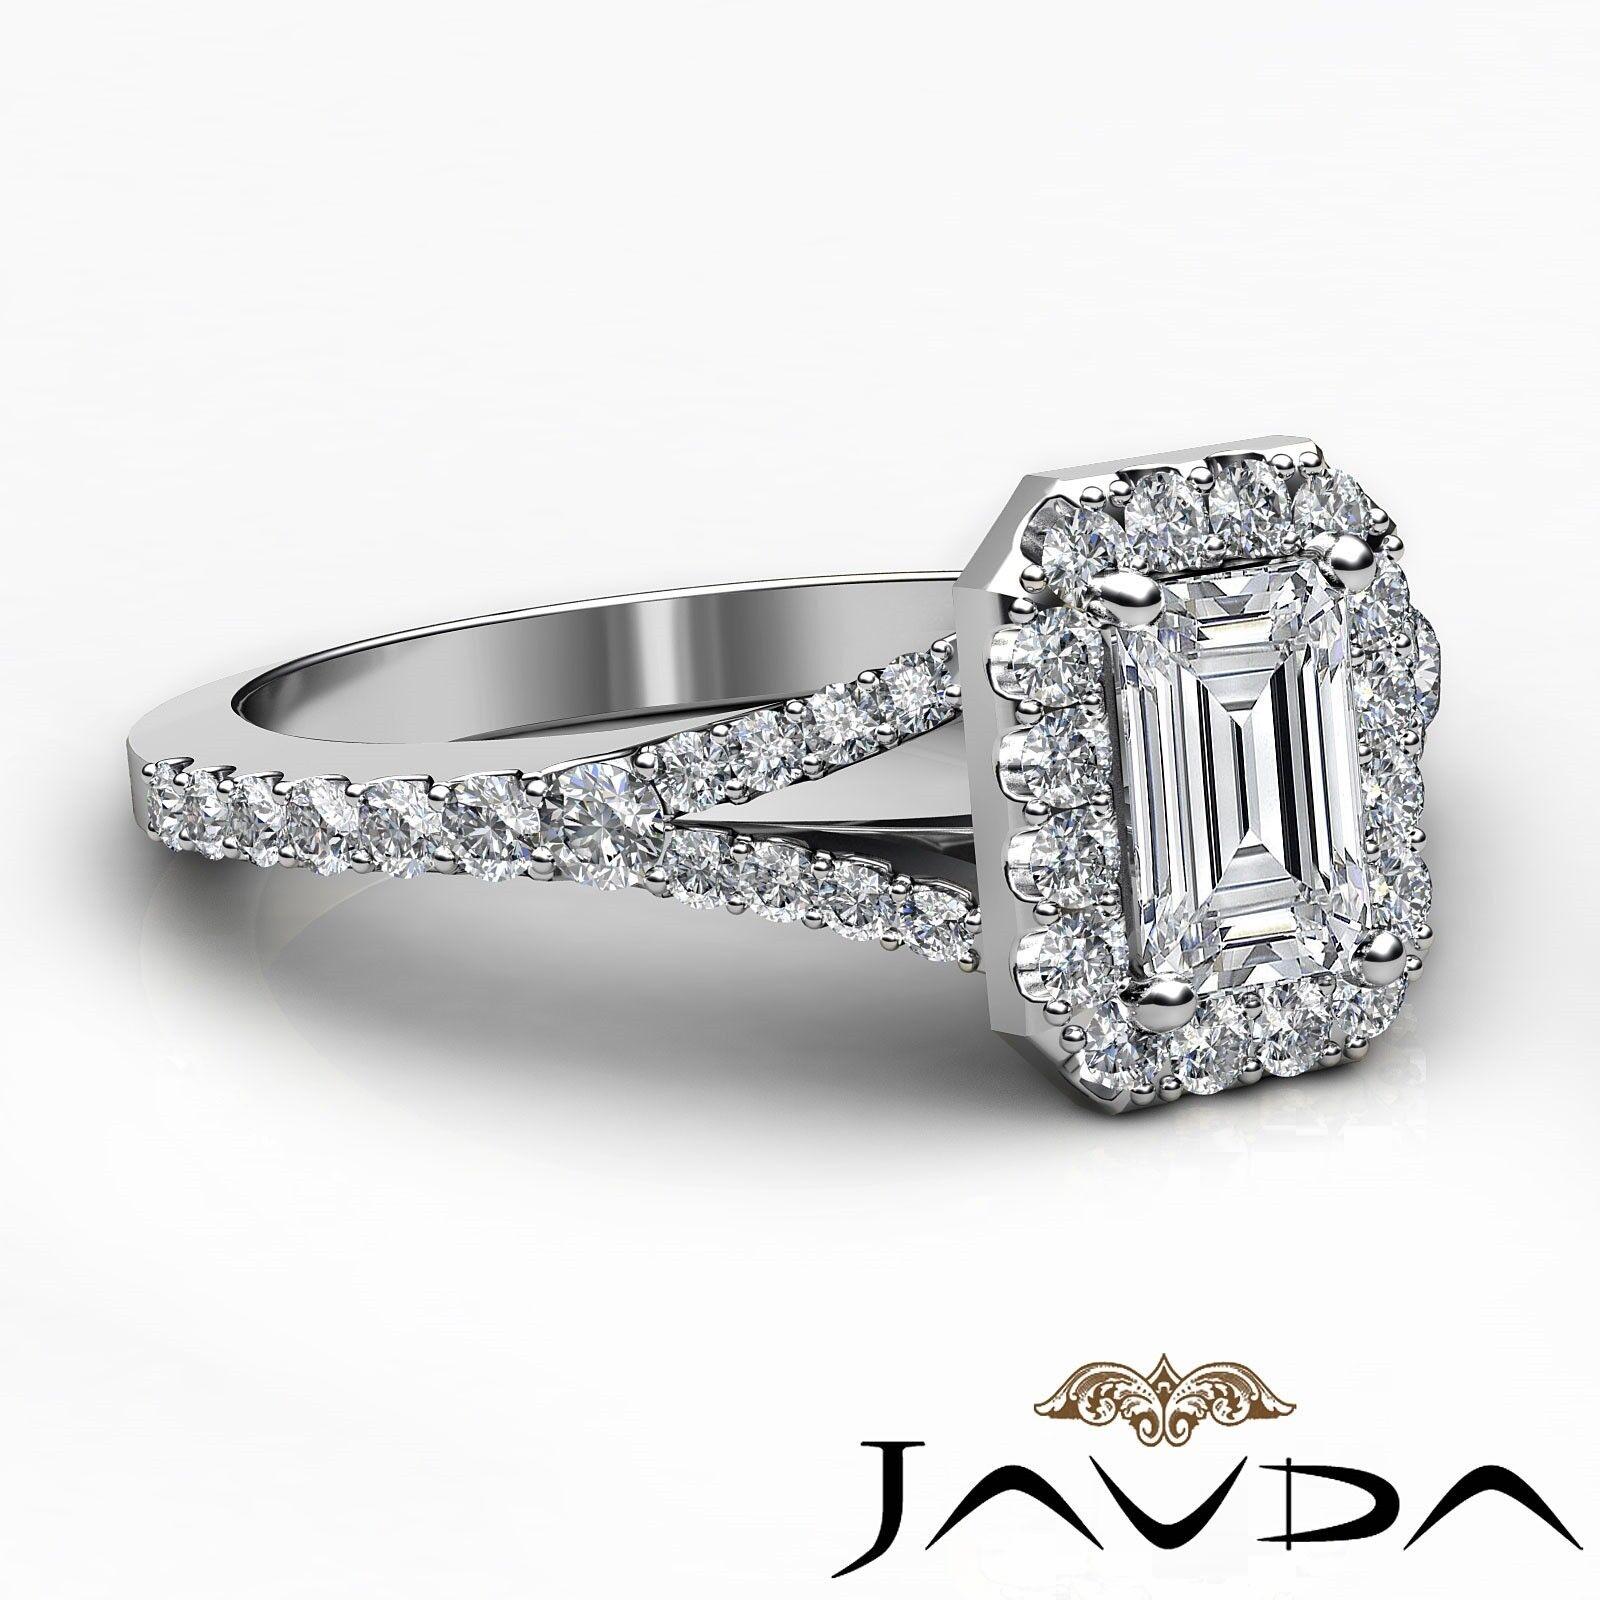 1.23ctw Halo U Pave Stone Emerald Diamond Engagement Ring GIA H-SI1 White Gold 5